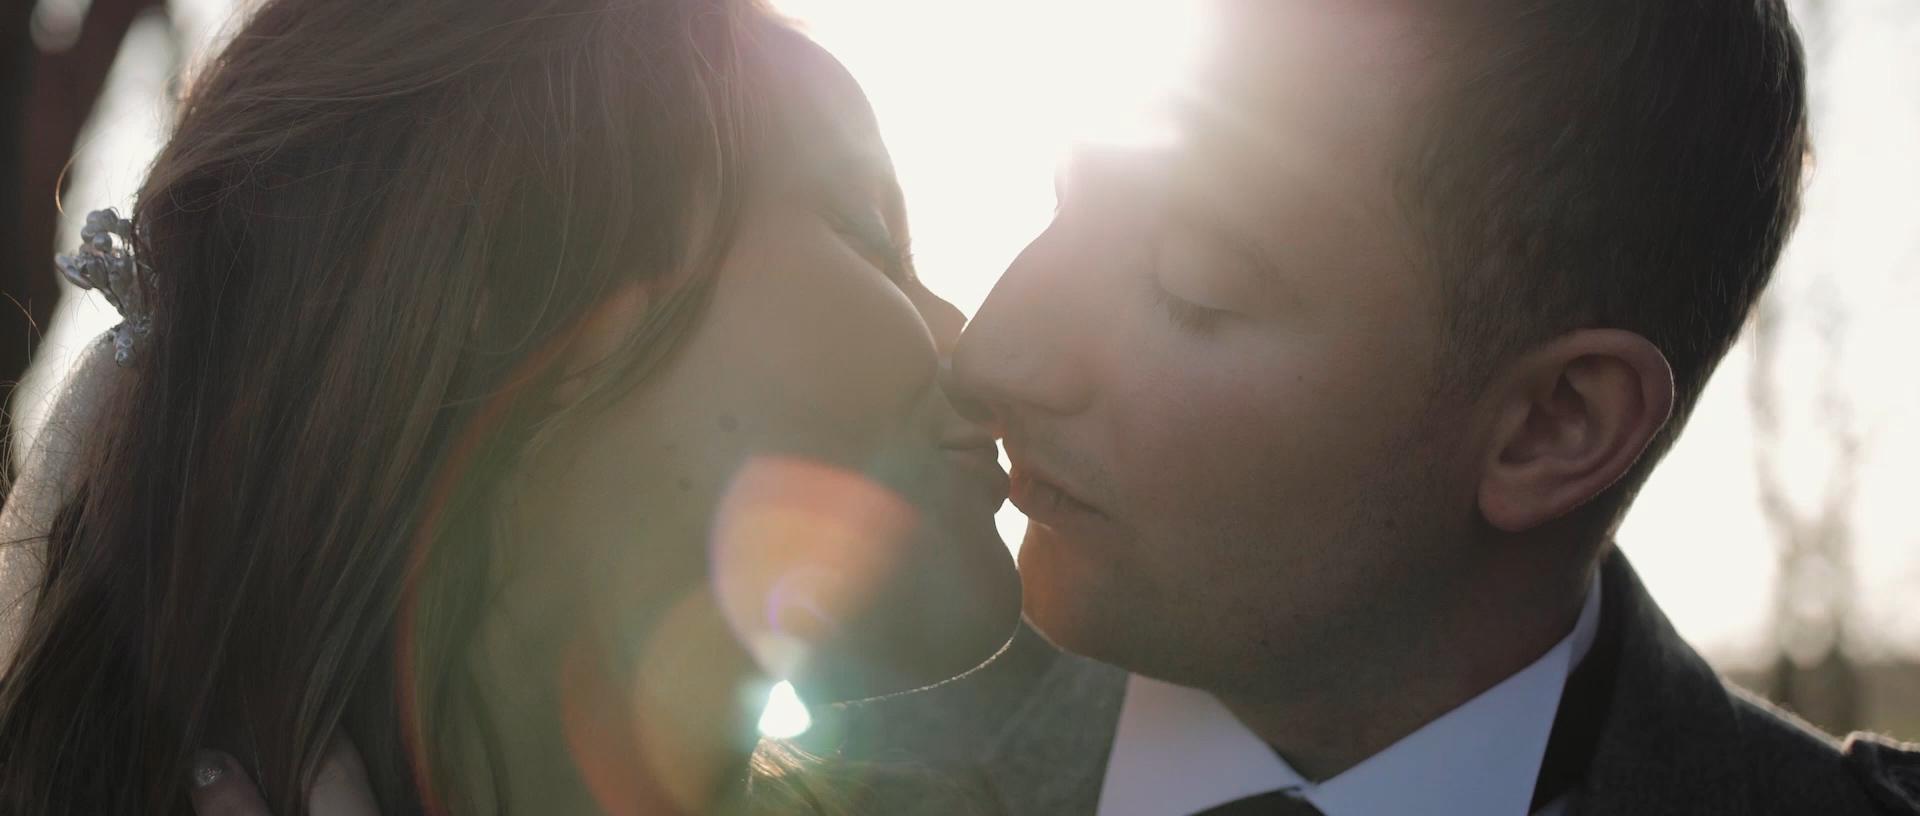 the-engine-works-wedding-videographer_LL_03.jpg